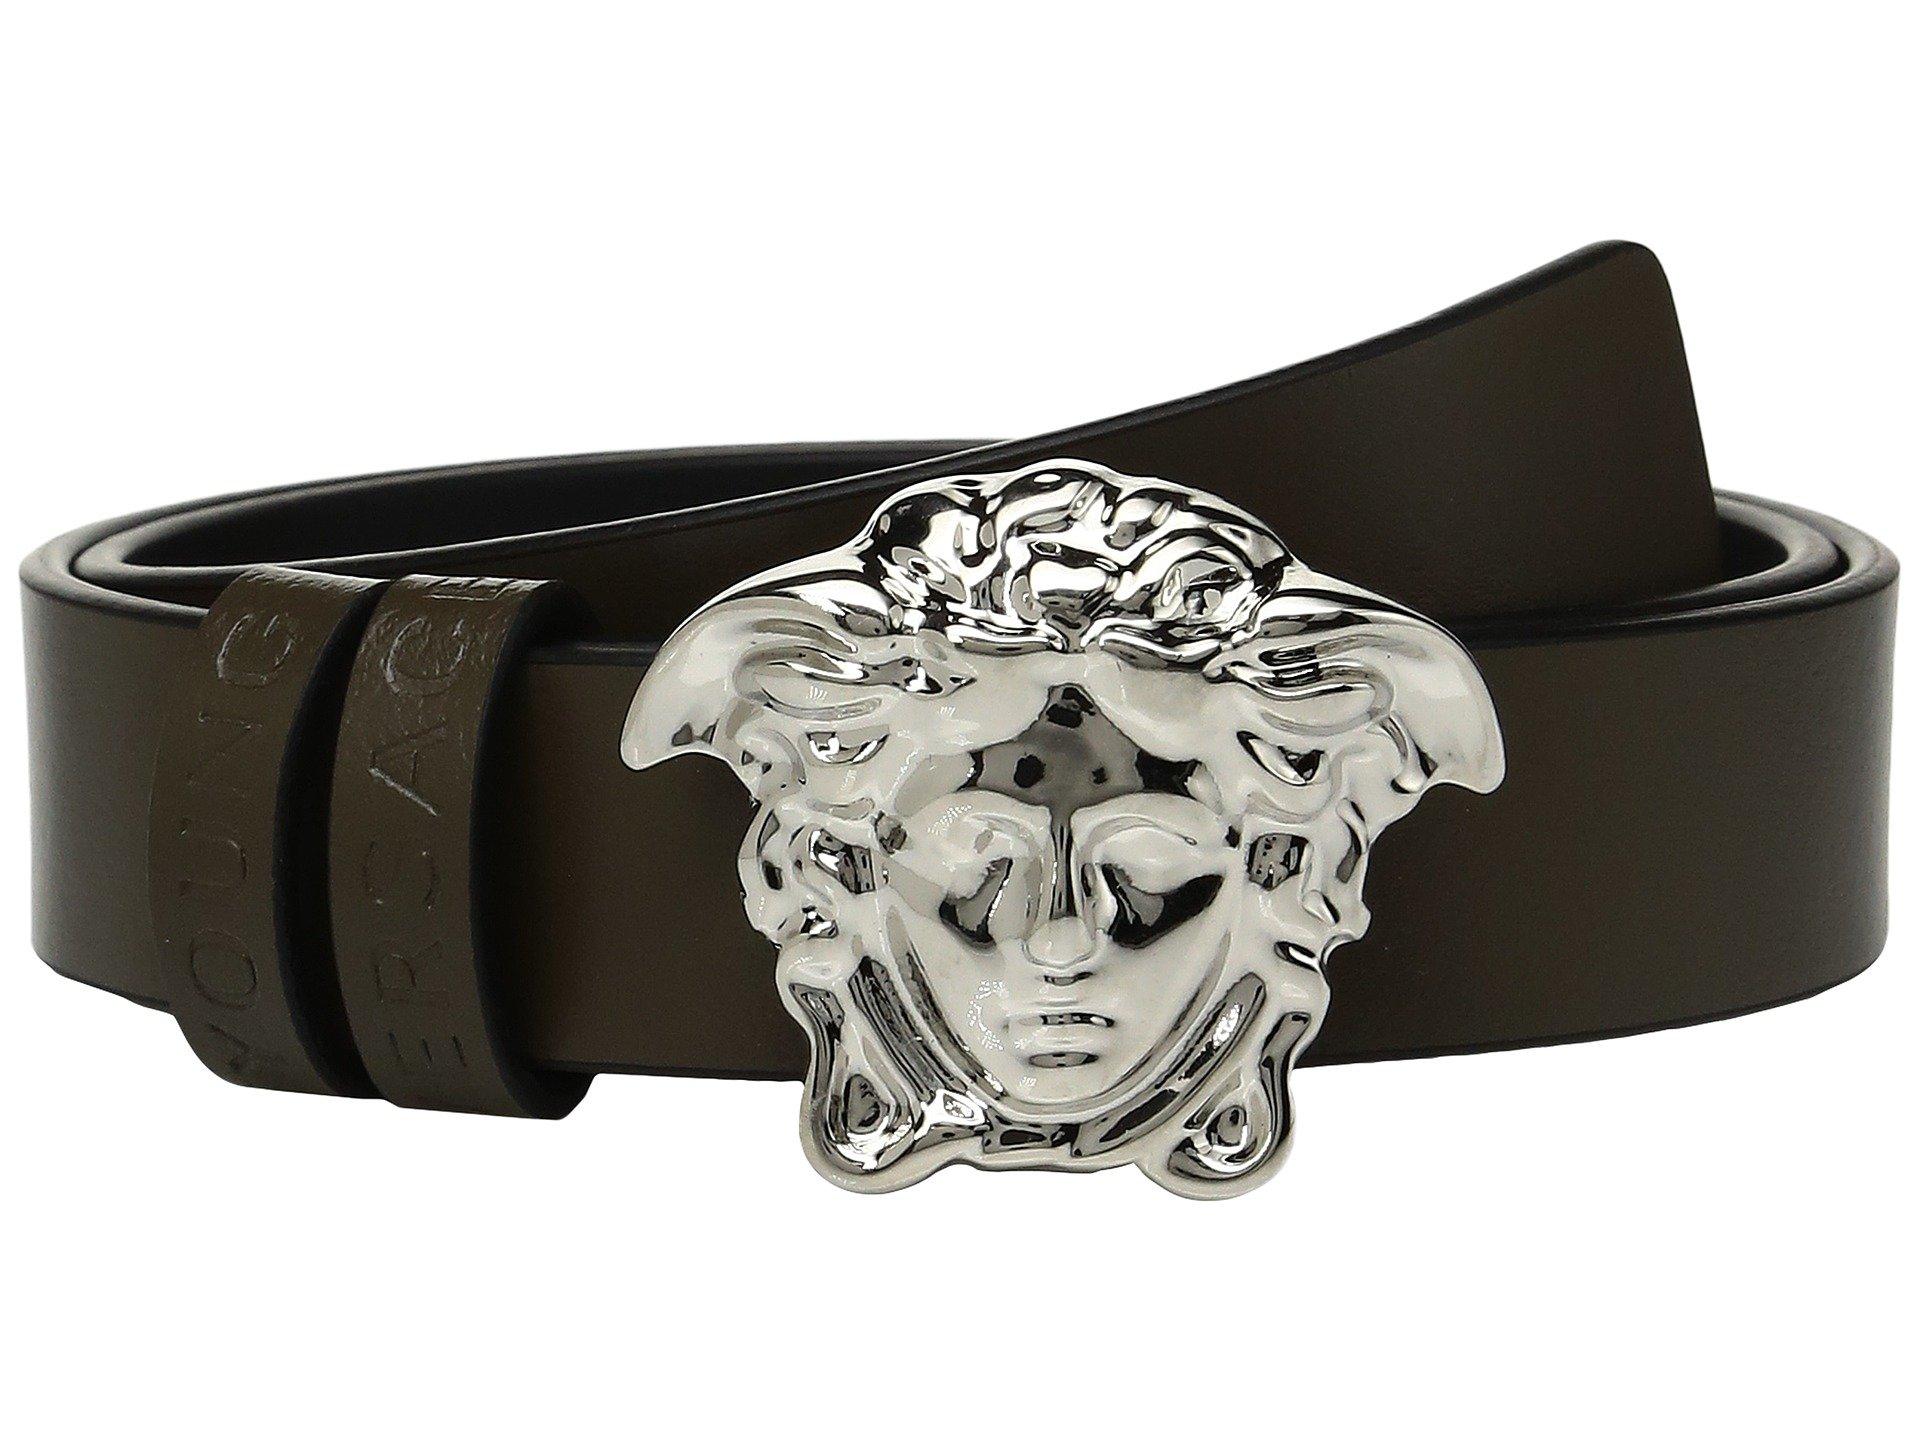 Cinturon para Niño Versace Kids Leather Belt with Medusa Buckle (Toddler/Little Kids)  + Versace en VeoyCompro.net